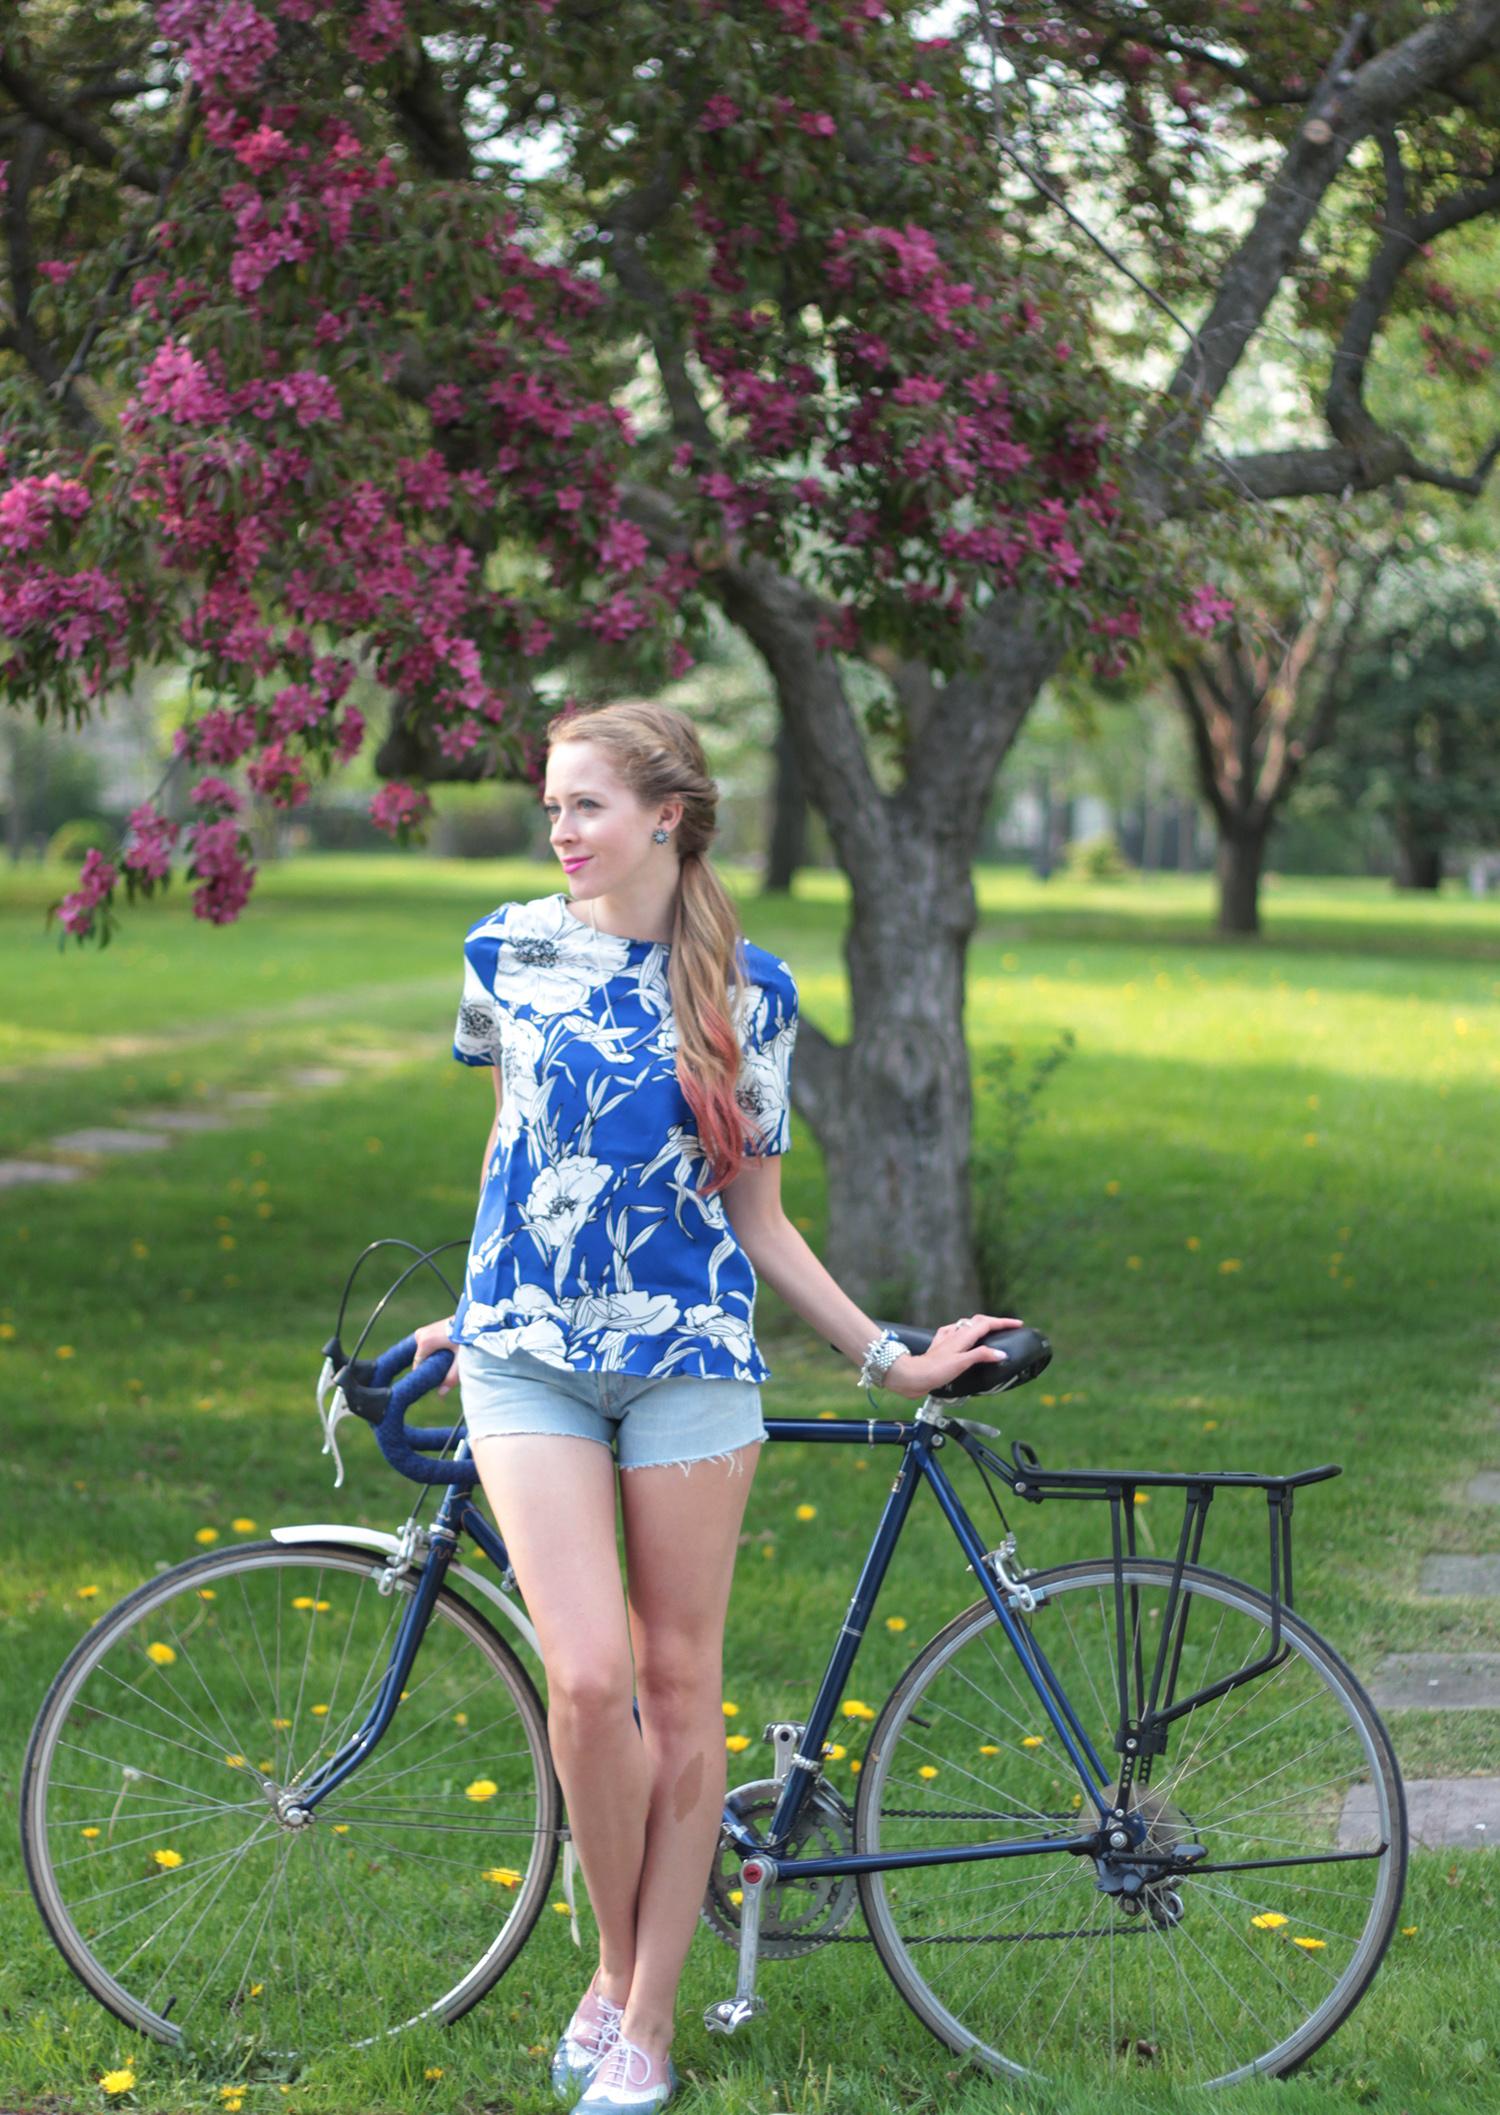 levi's 501 denim shorts for summer